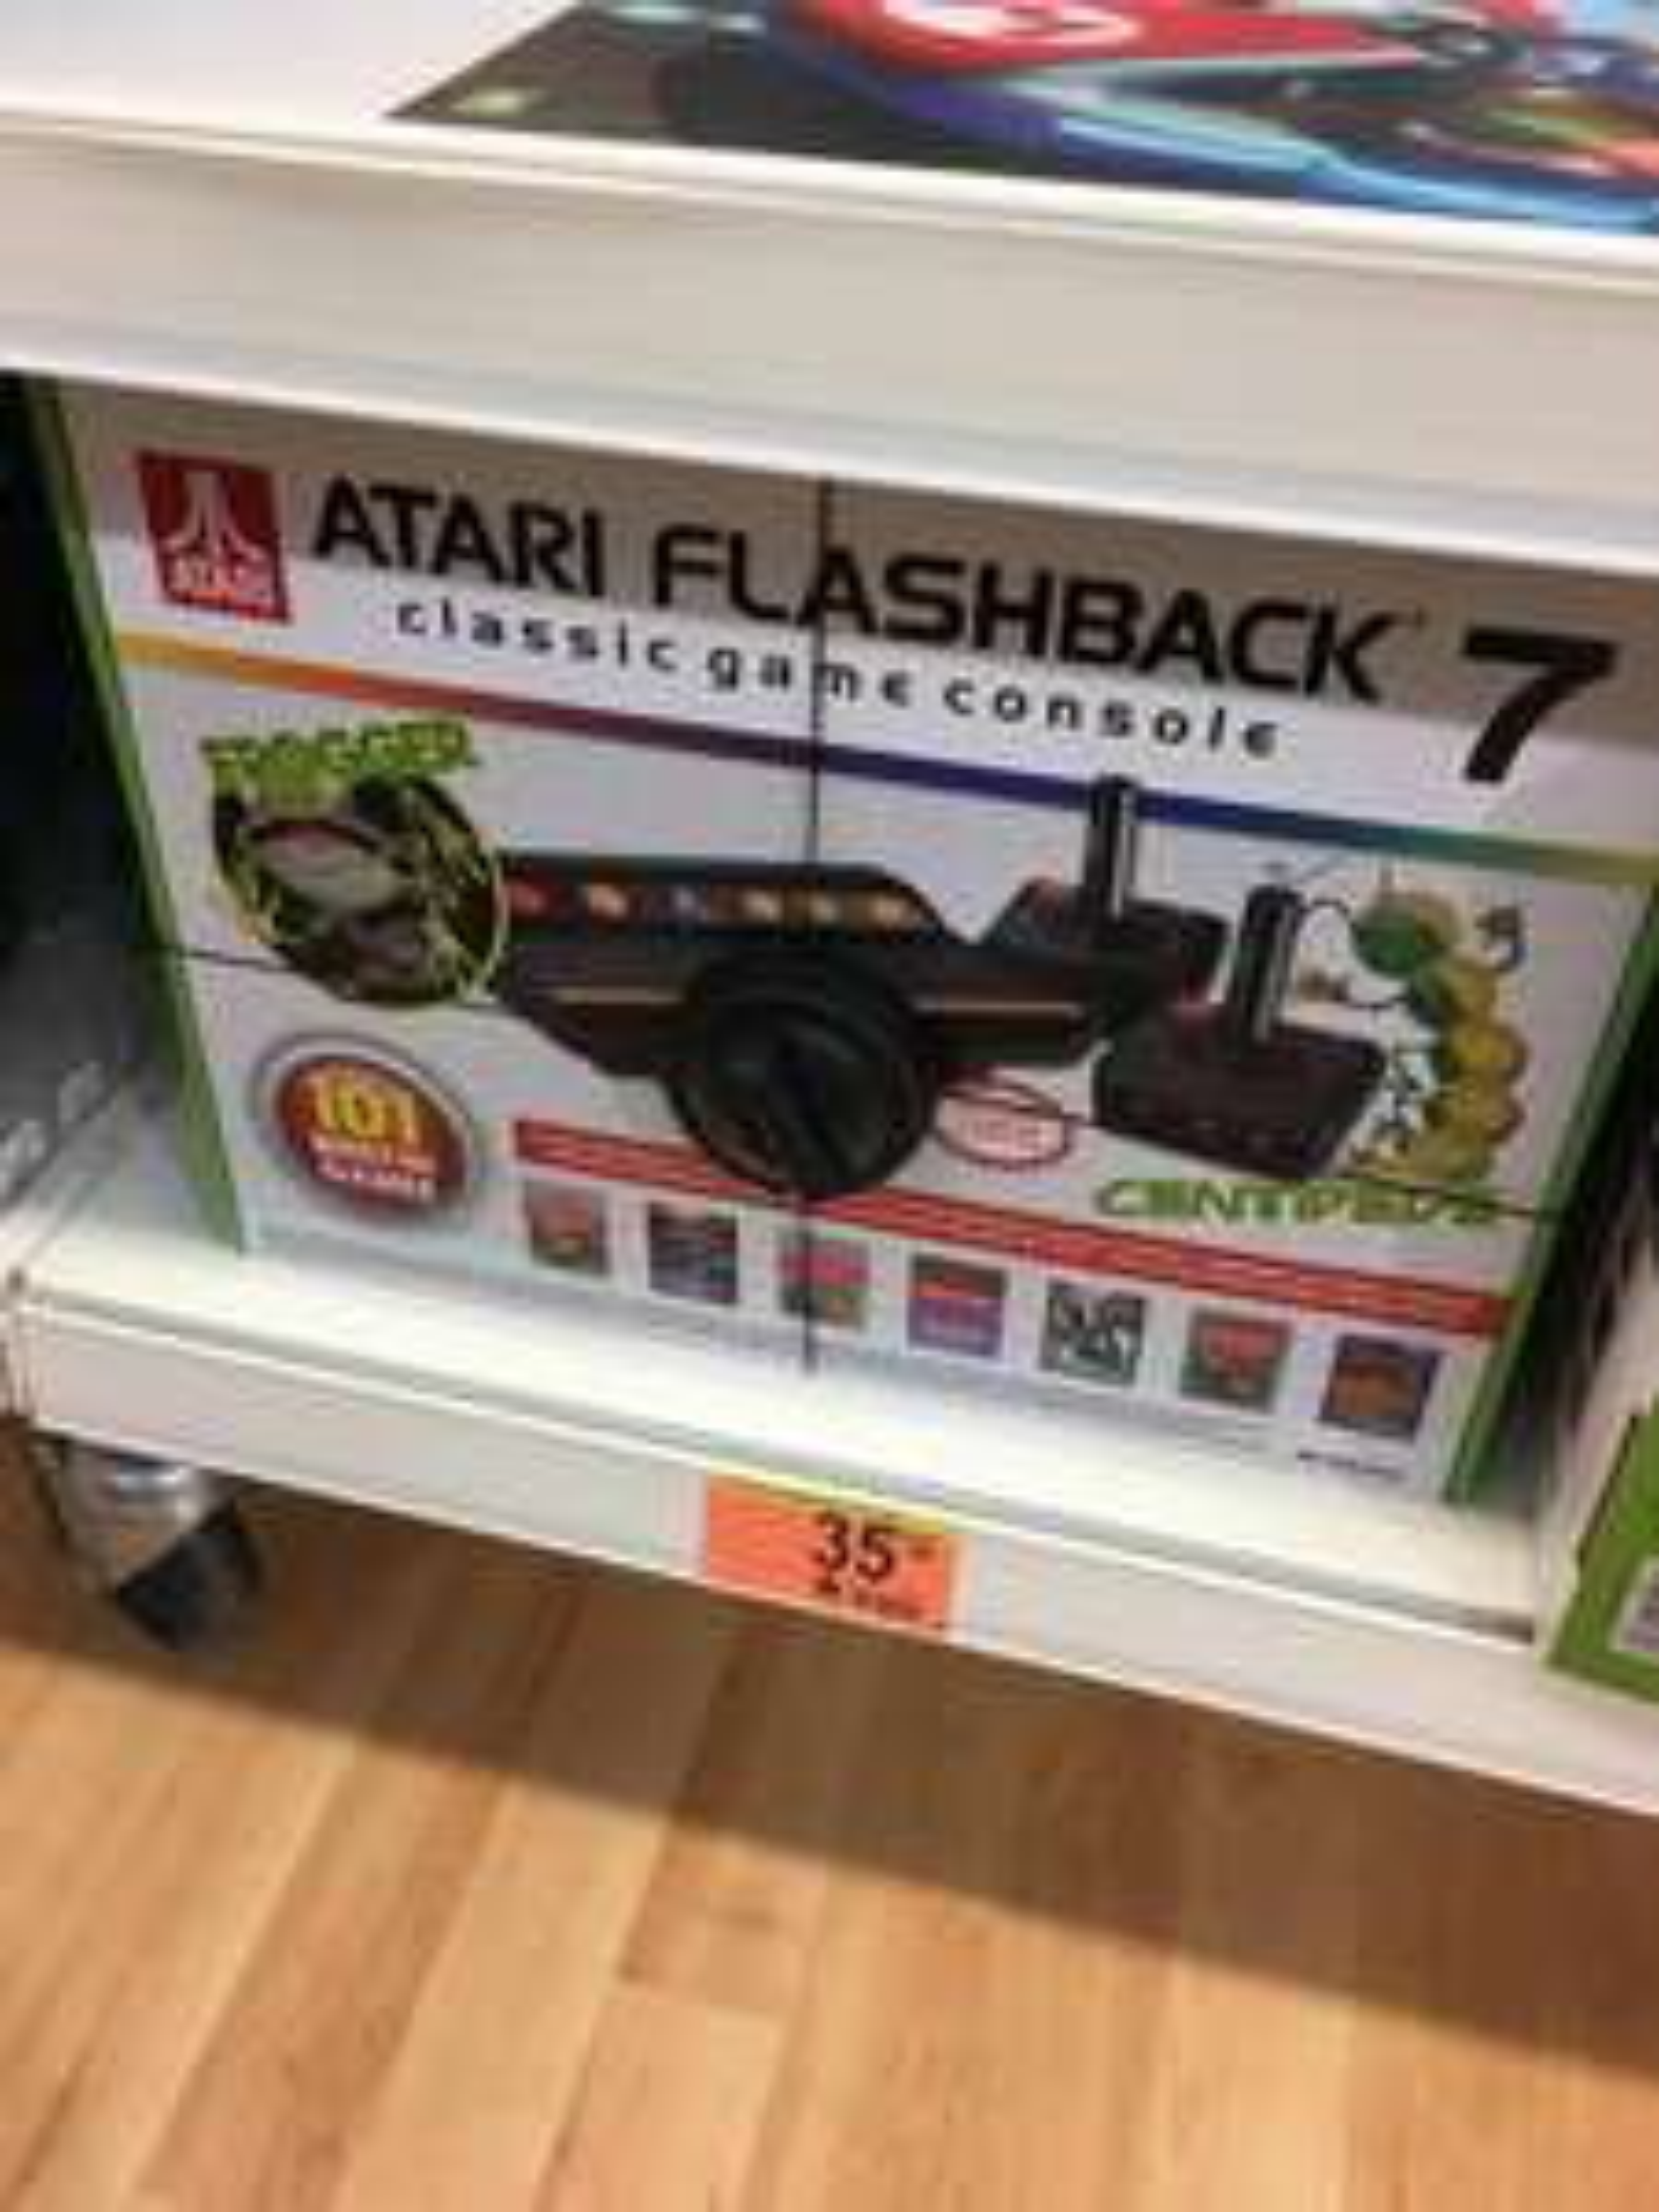 Console Atari classic flashback 7